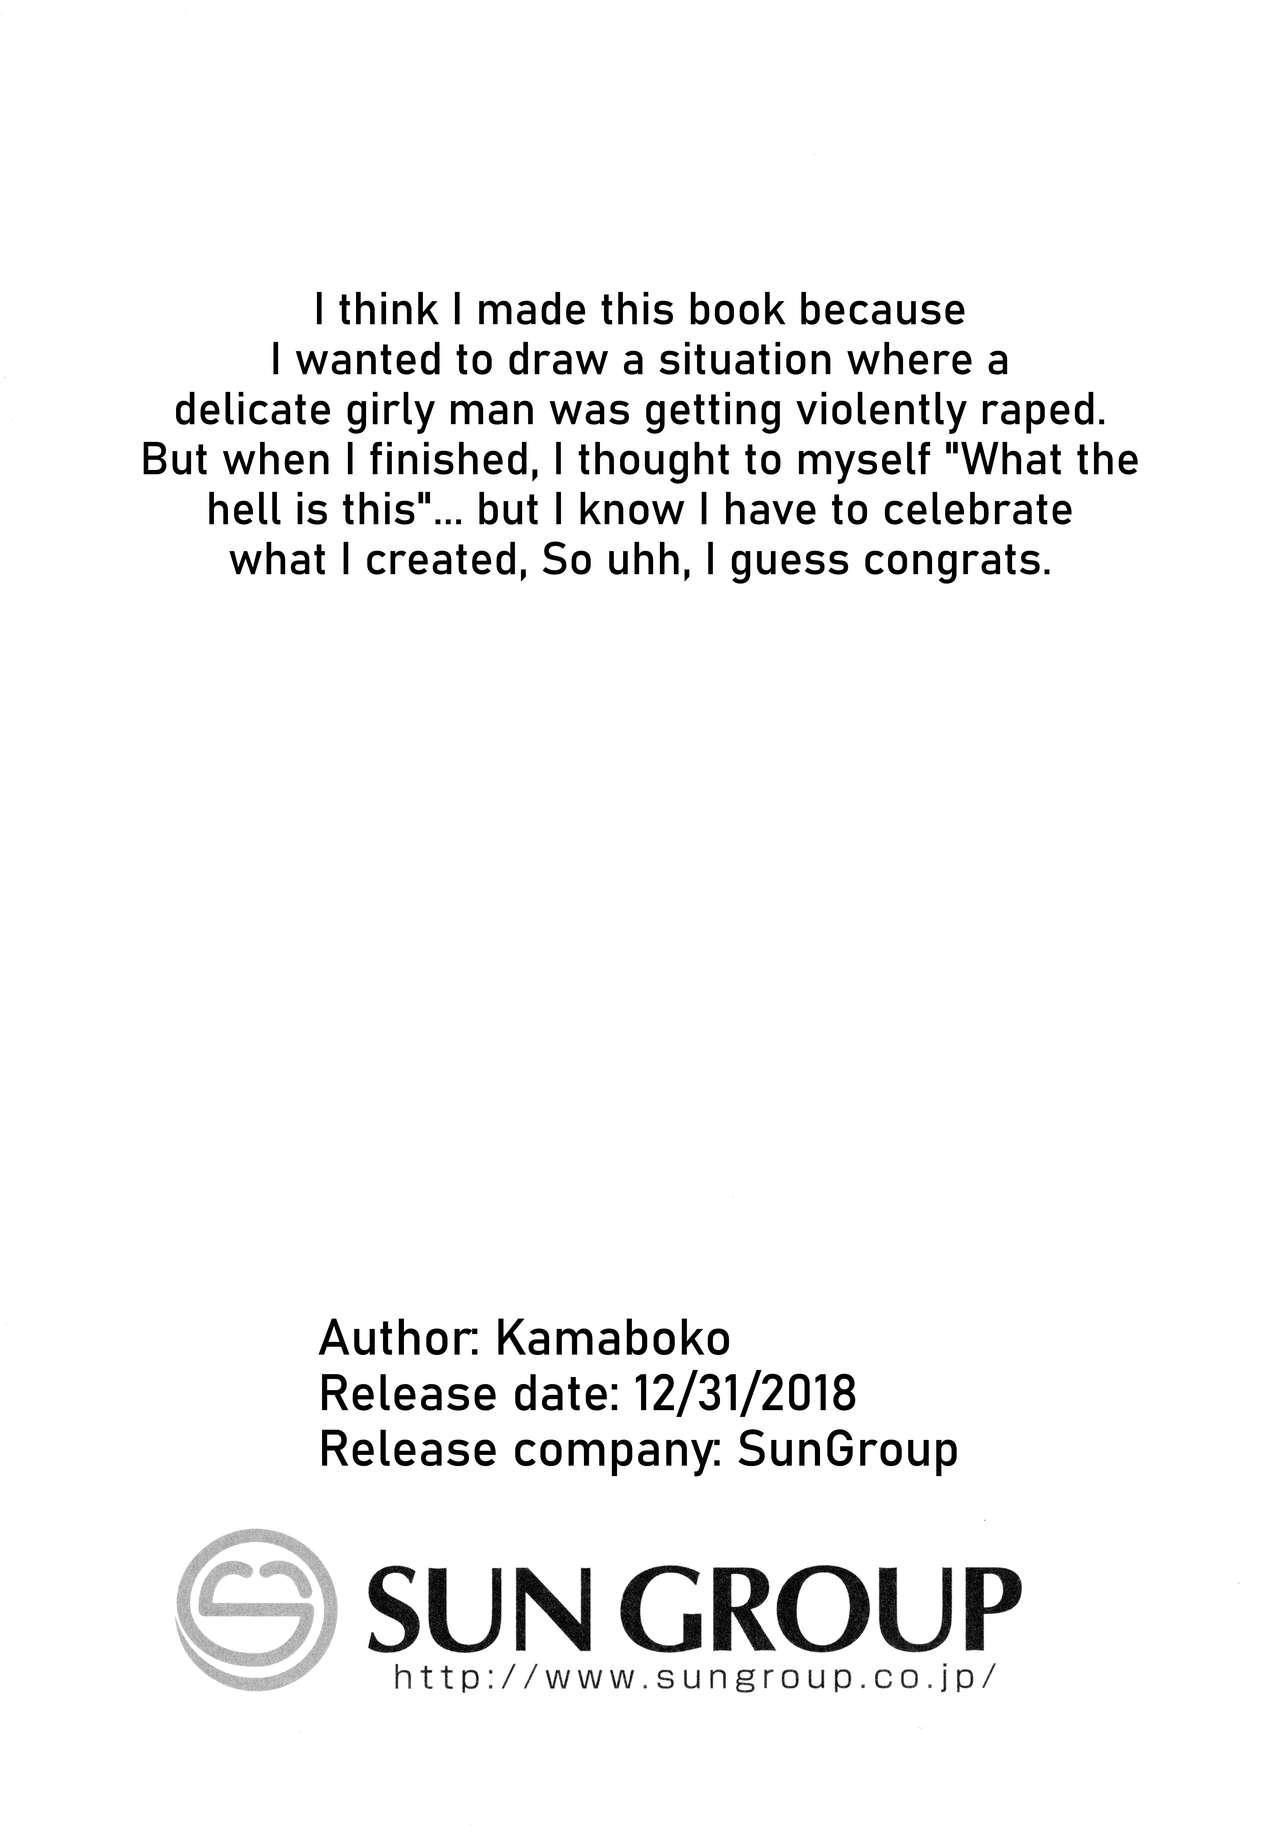 (C95) [Kamaboko Koubou (Kamaboko)] Nobukatsu-kun ga Aneue ni Horareru Hon | The Book Where Nobukatsu-kun Gets Drilled By His Sister (Fate/Grand Order) [English] [UncontrolSwitchOverflow] 24